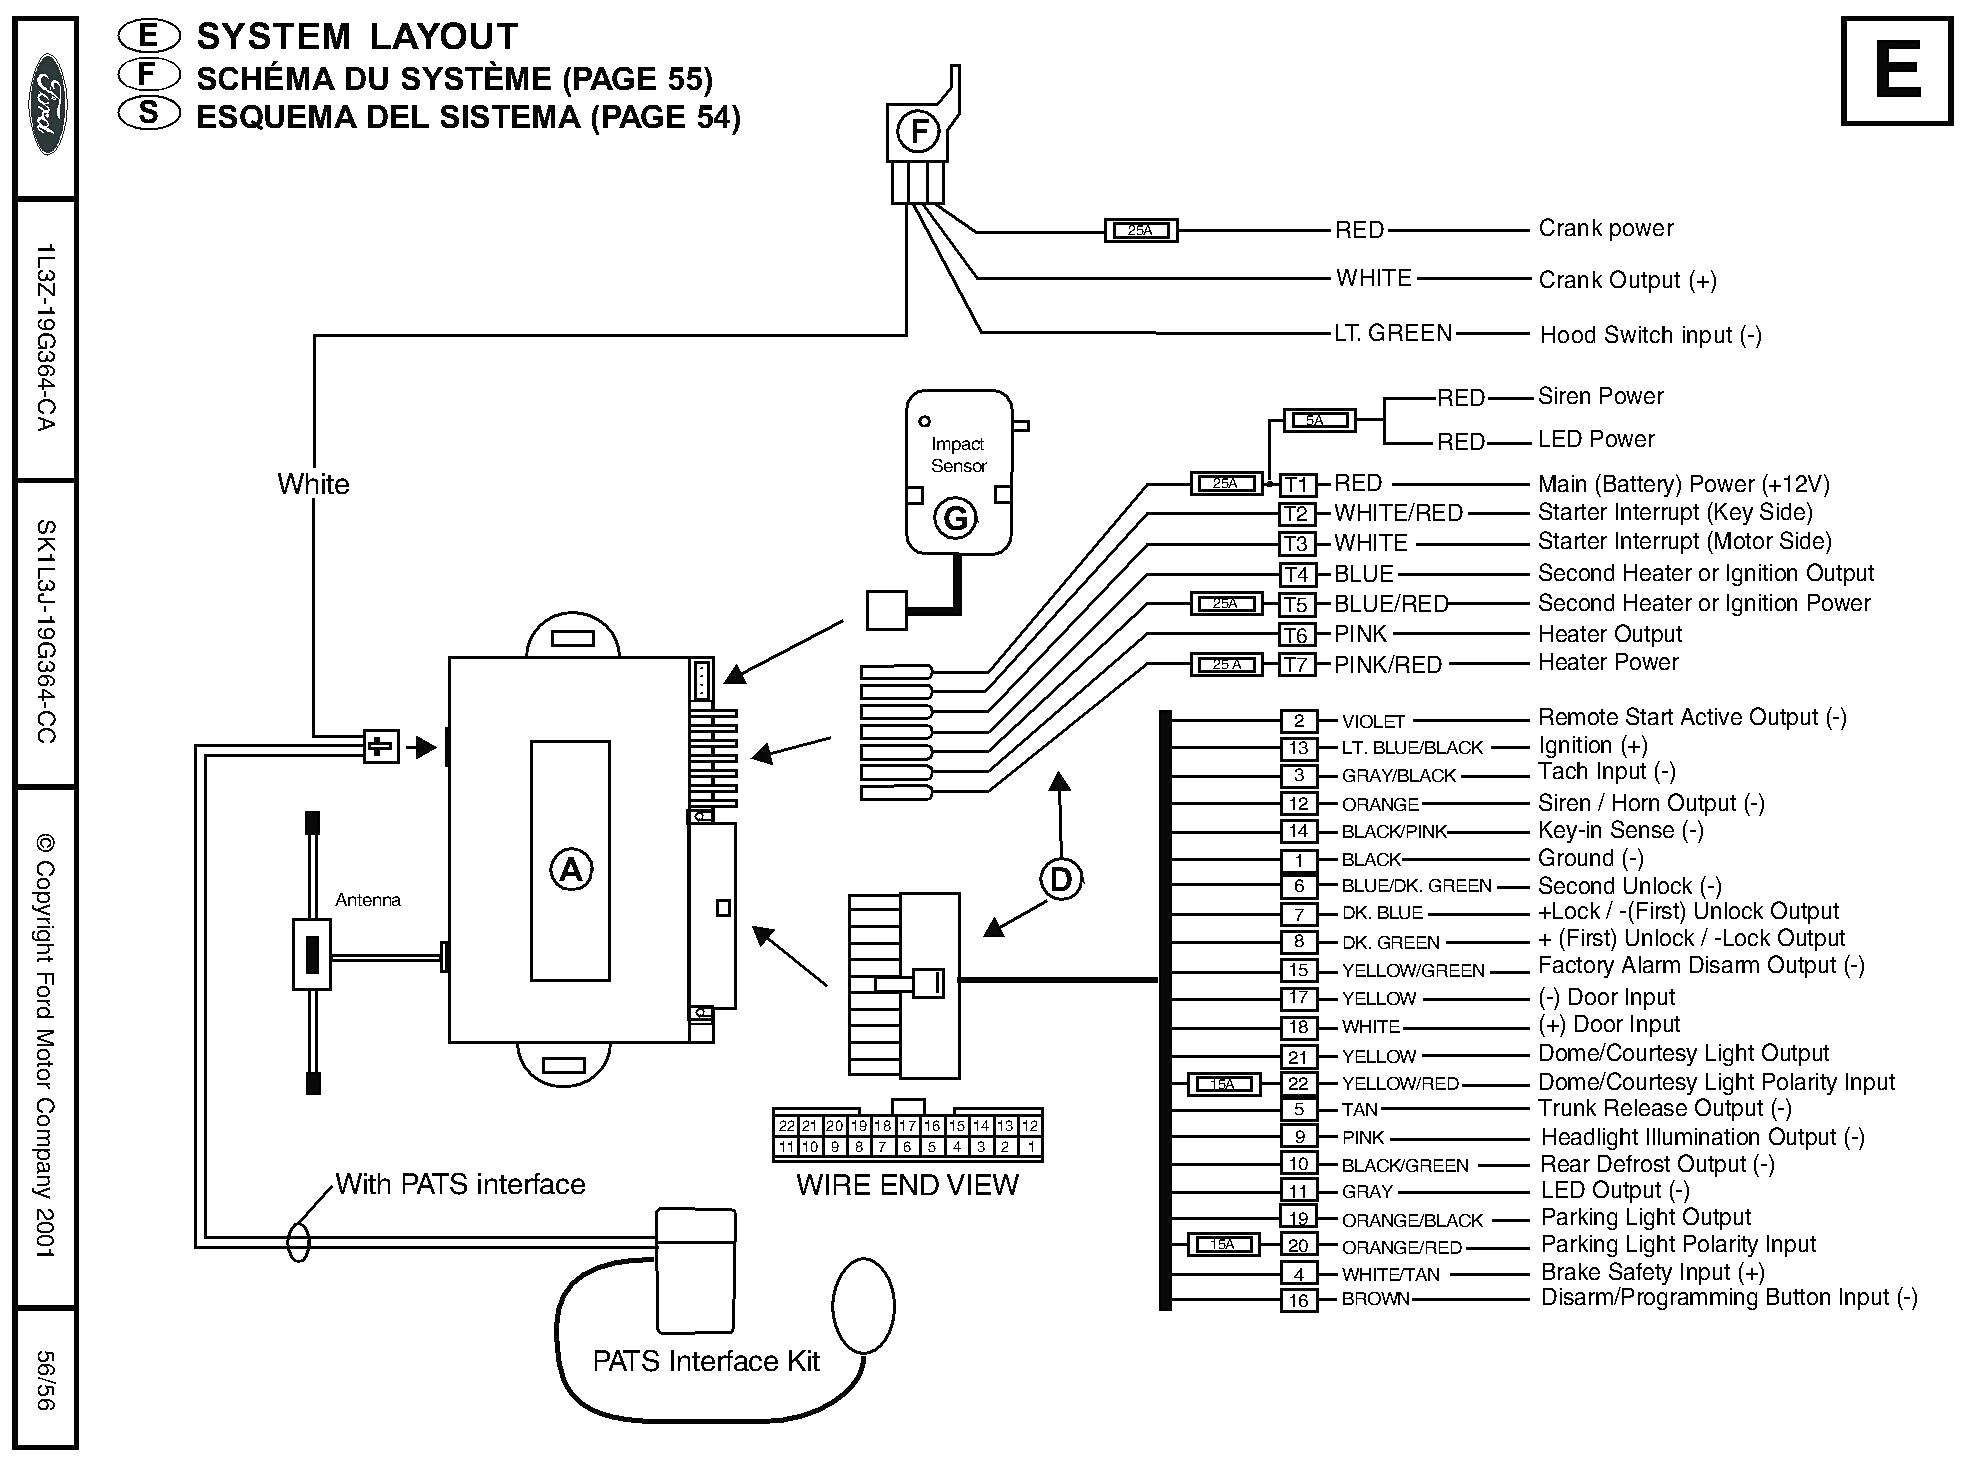 avital 3100 1 way wiring diagram wiring diagram fascinatingavital 3100 1 way wiring diagram data wiring